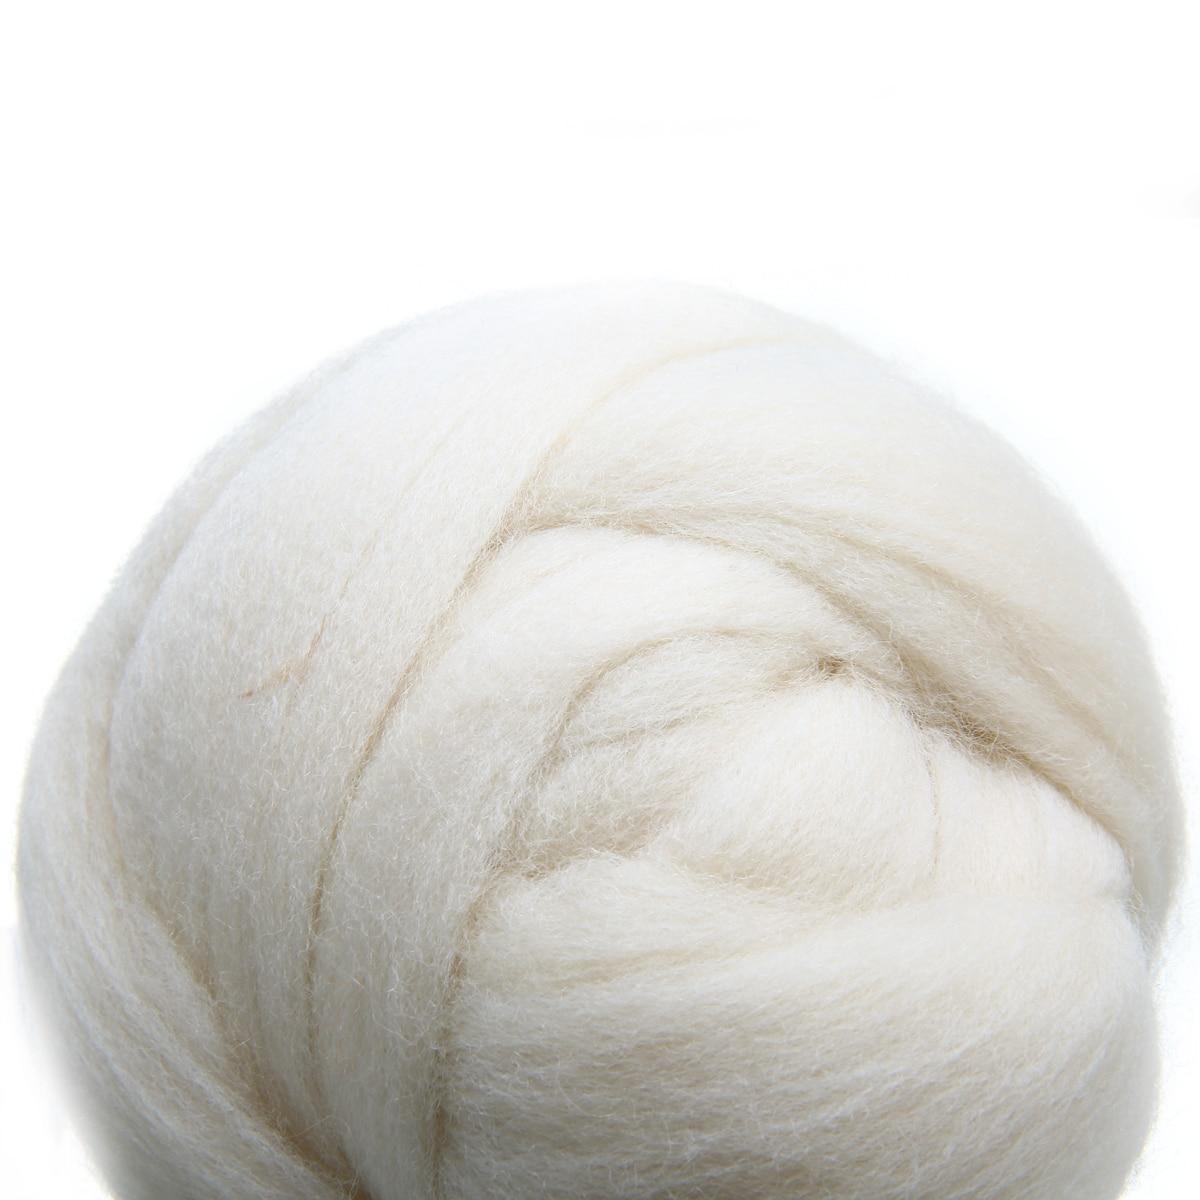 100g Cream White Wool Fiber Needle Felting Wool Tops Roving Spinning Weaving For Handmade DIY Craft Doll Felting Wool